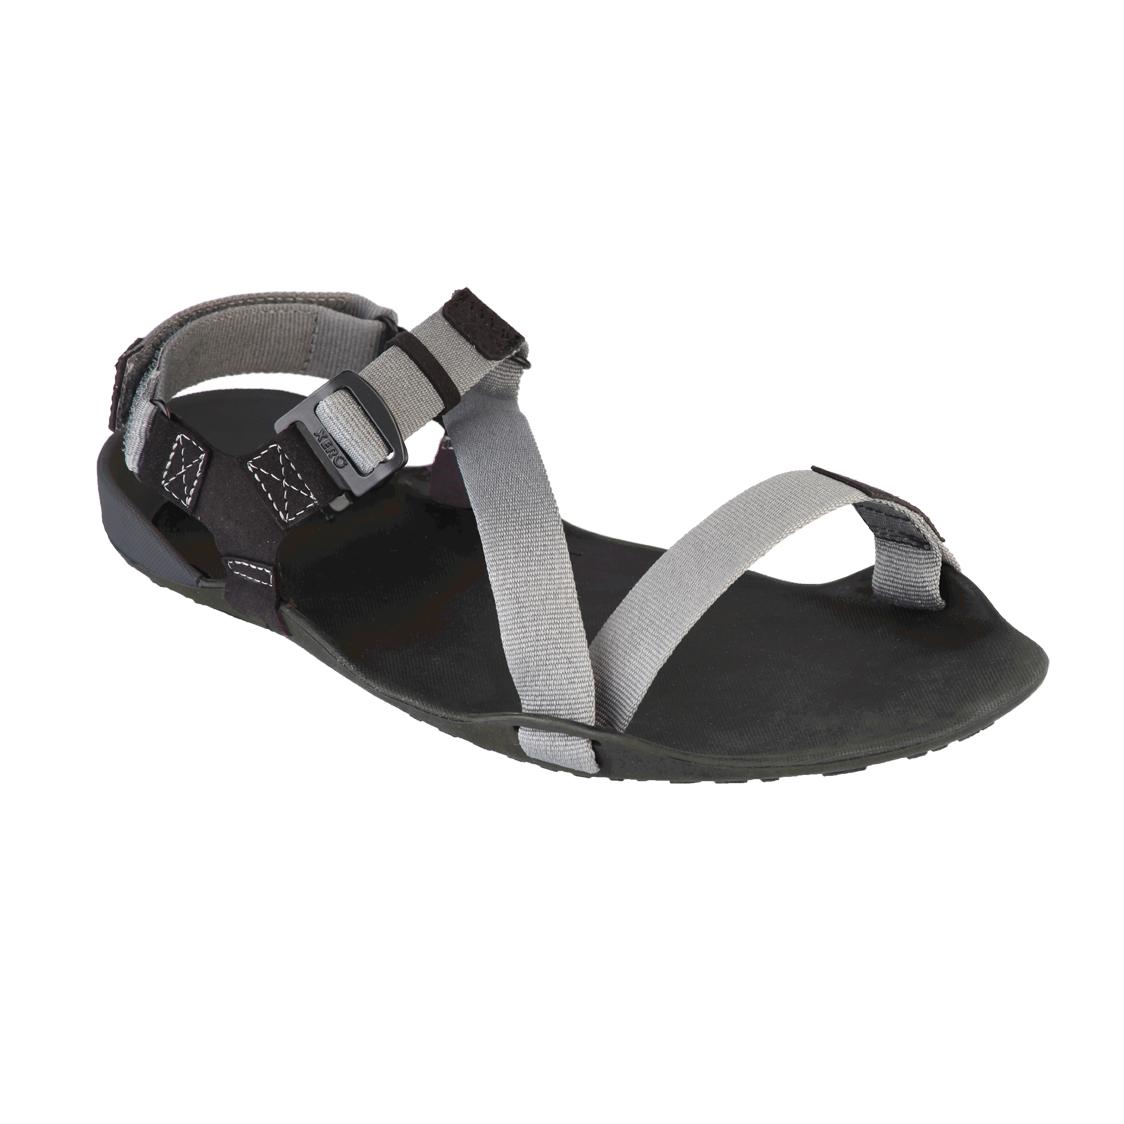 Elegant Xero Shoes ZTrek Lightweight Sport Sandal  Women  EBay